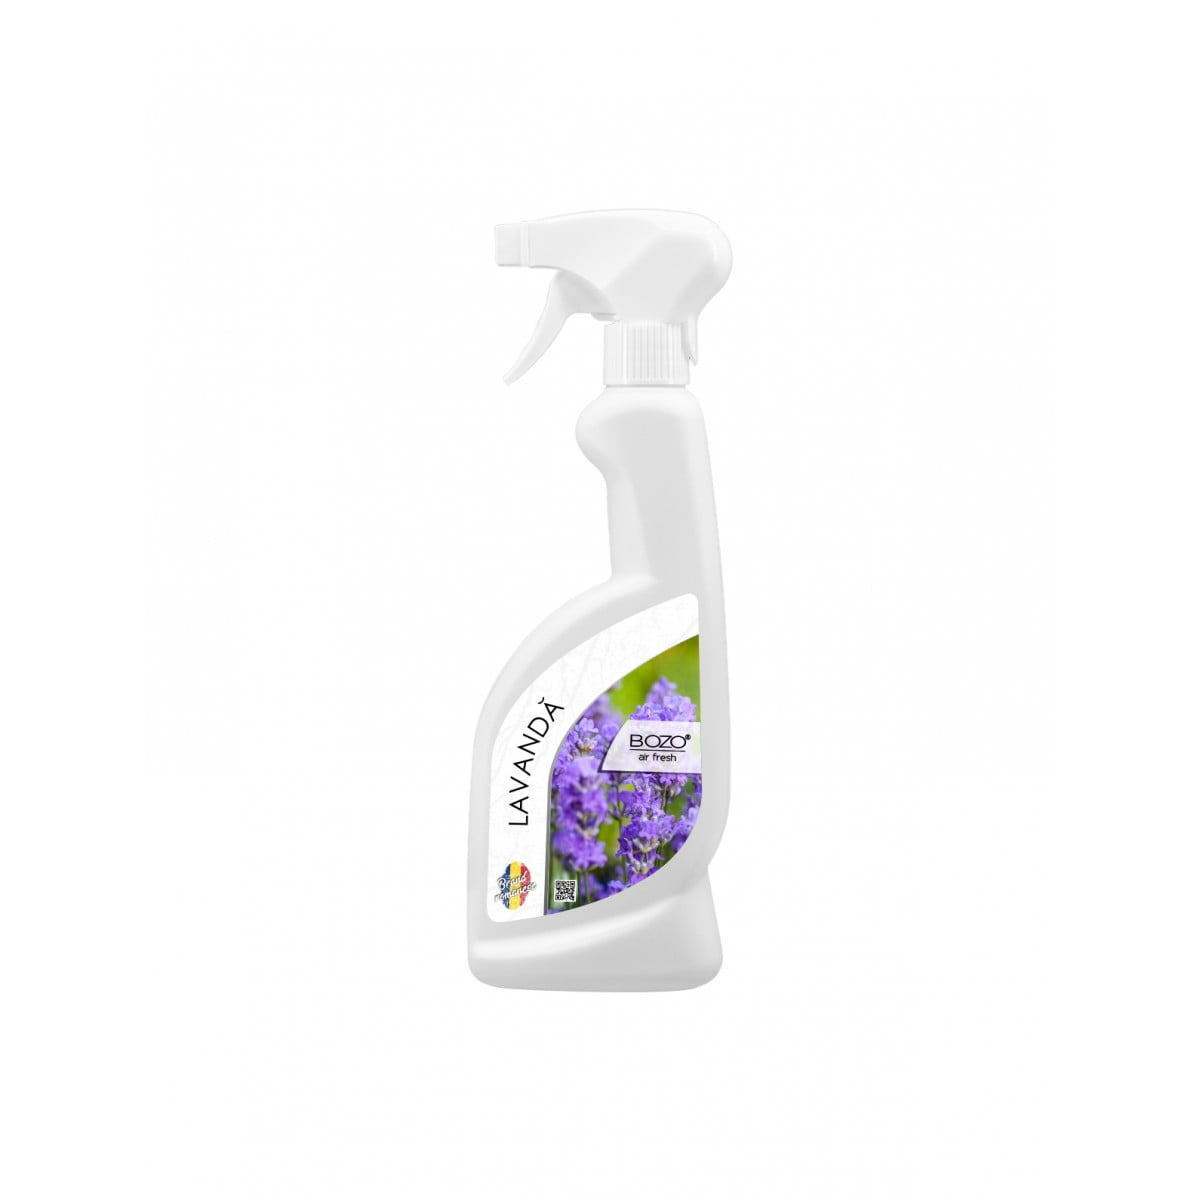 Odorizant ambiental concentrat cu aroma lavanda, Bozo Air Fresh - Lavender - 500ml imagine 2021 somnart.ro